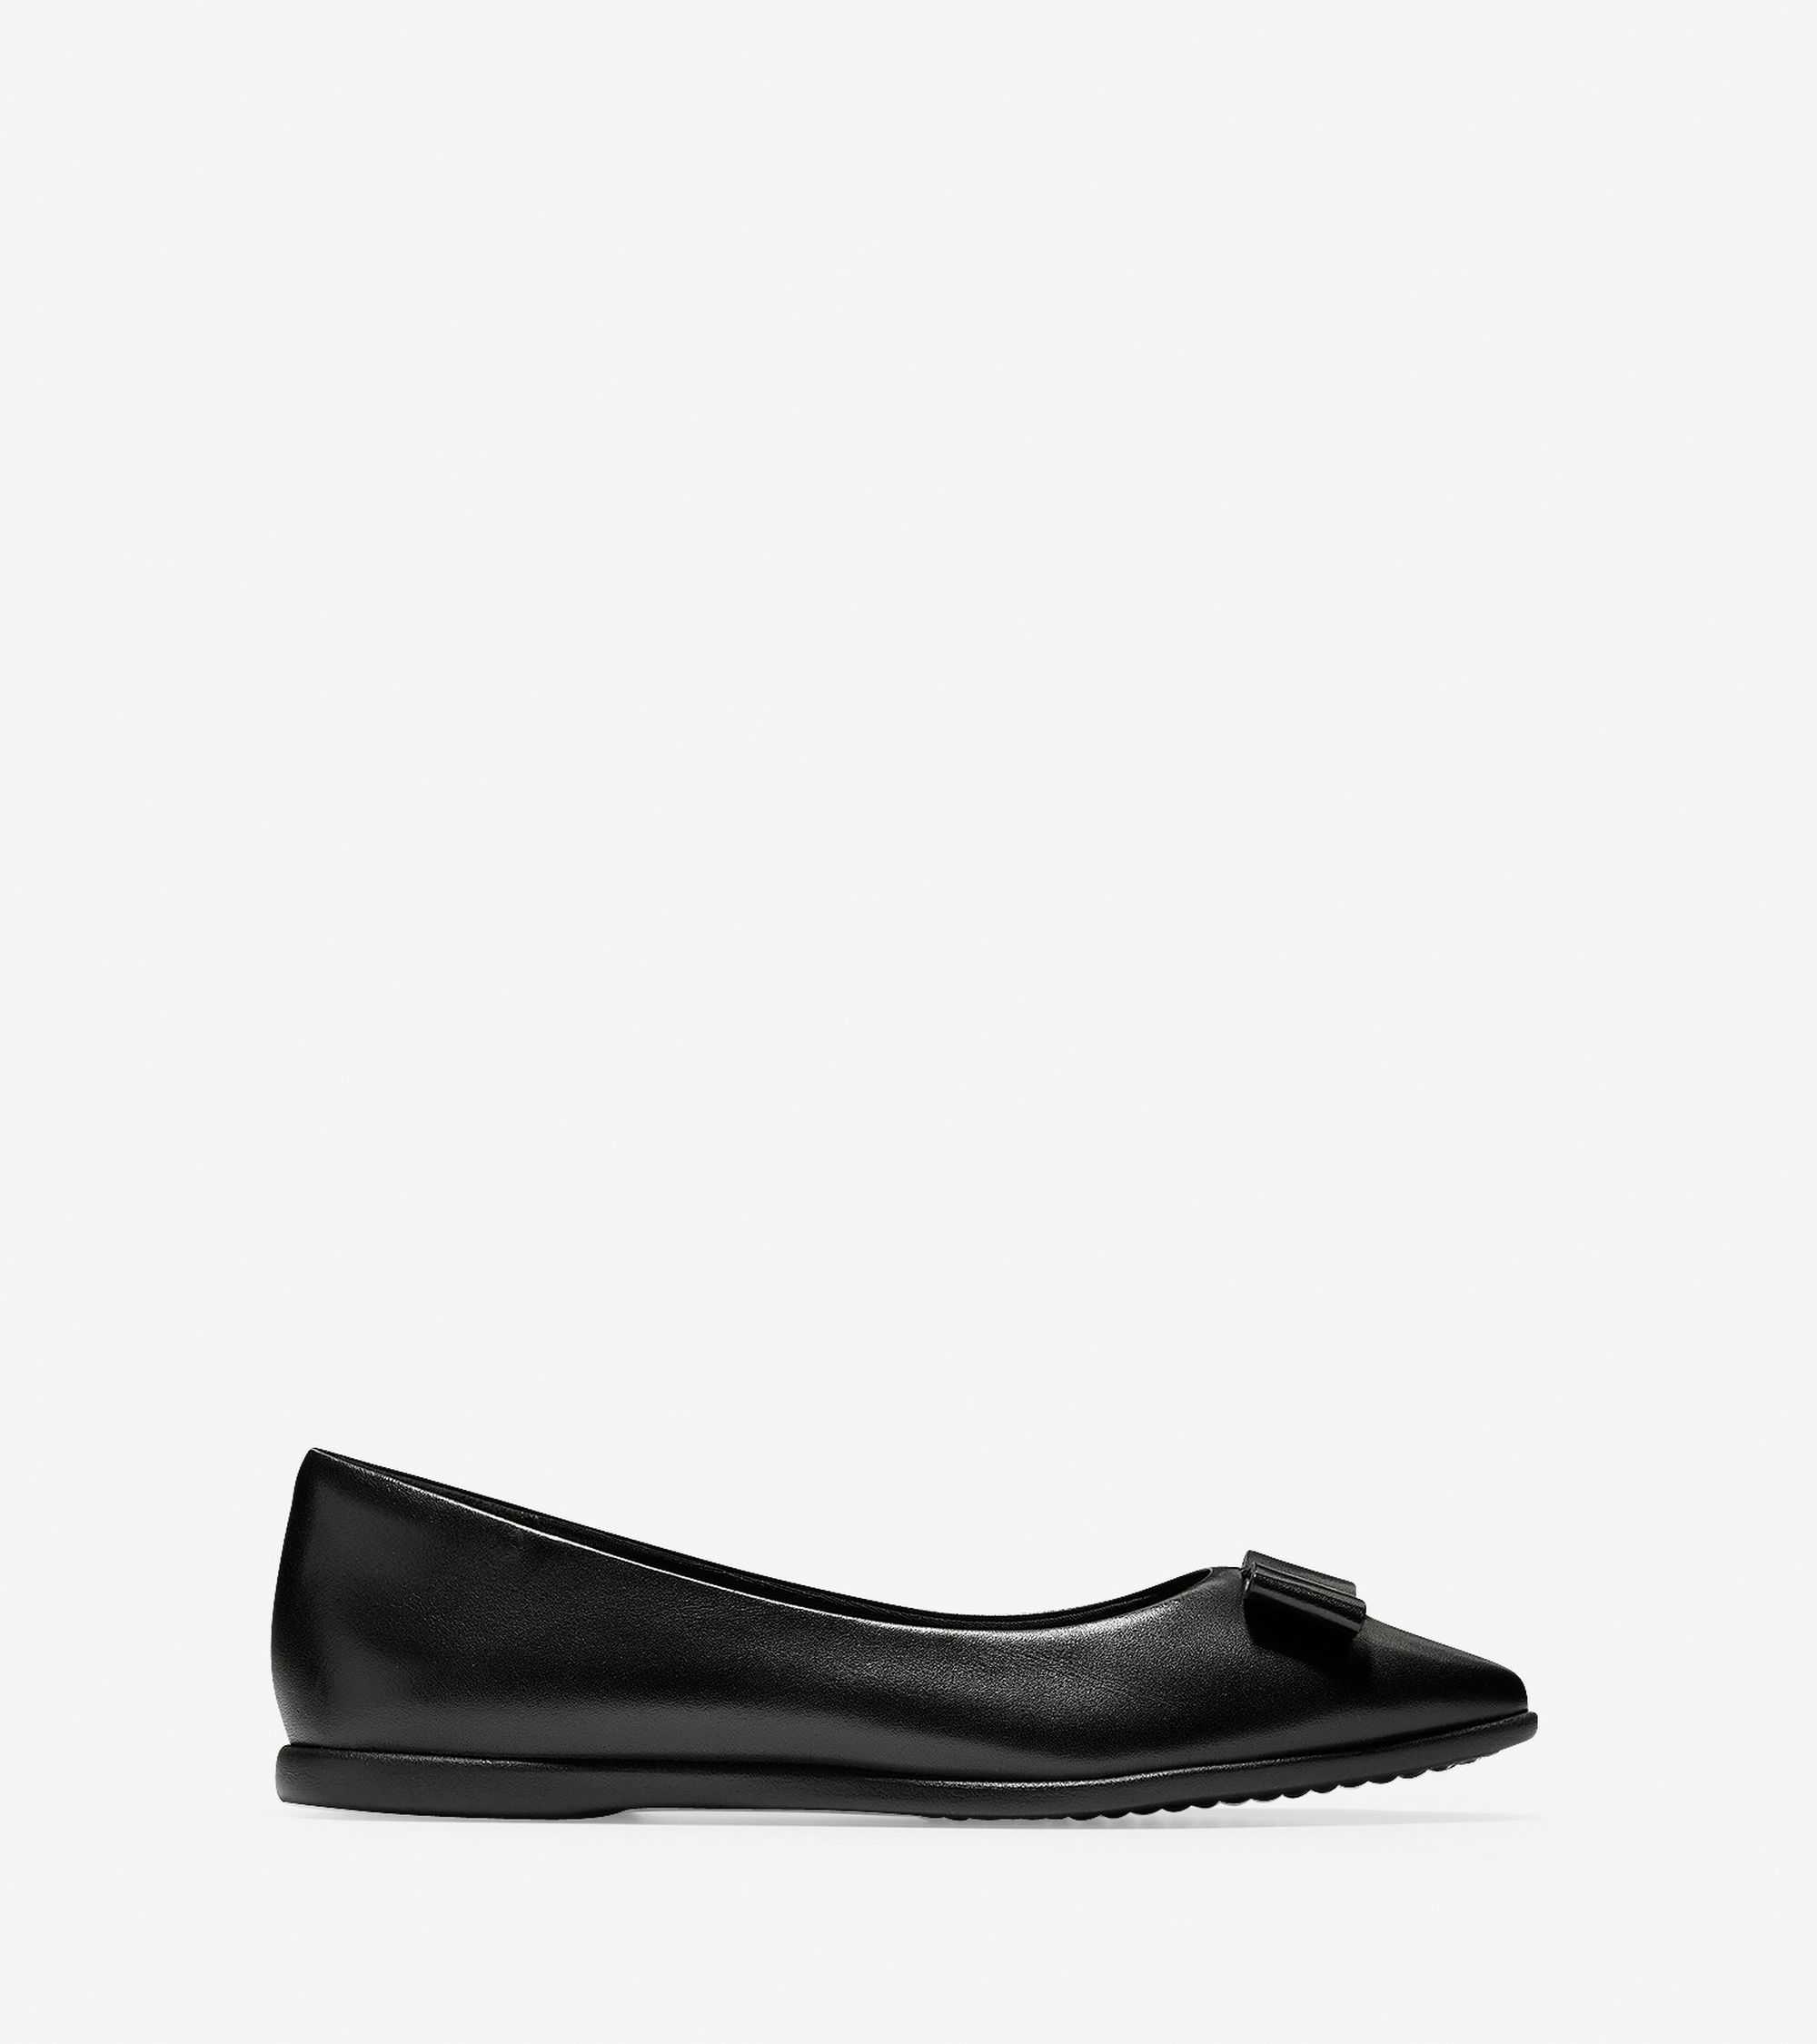 b733dbba4 Cole Haan Women's 3.ZERØGRAND Bow Skimmer Flat (Black, 8.5 C) in ...